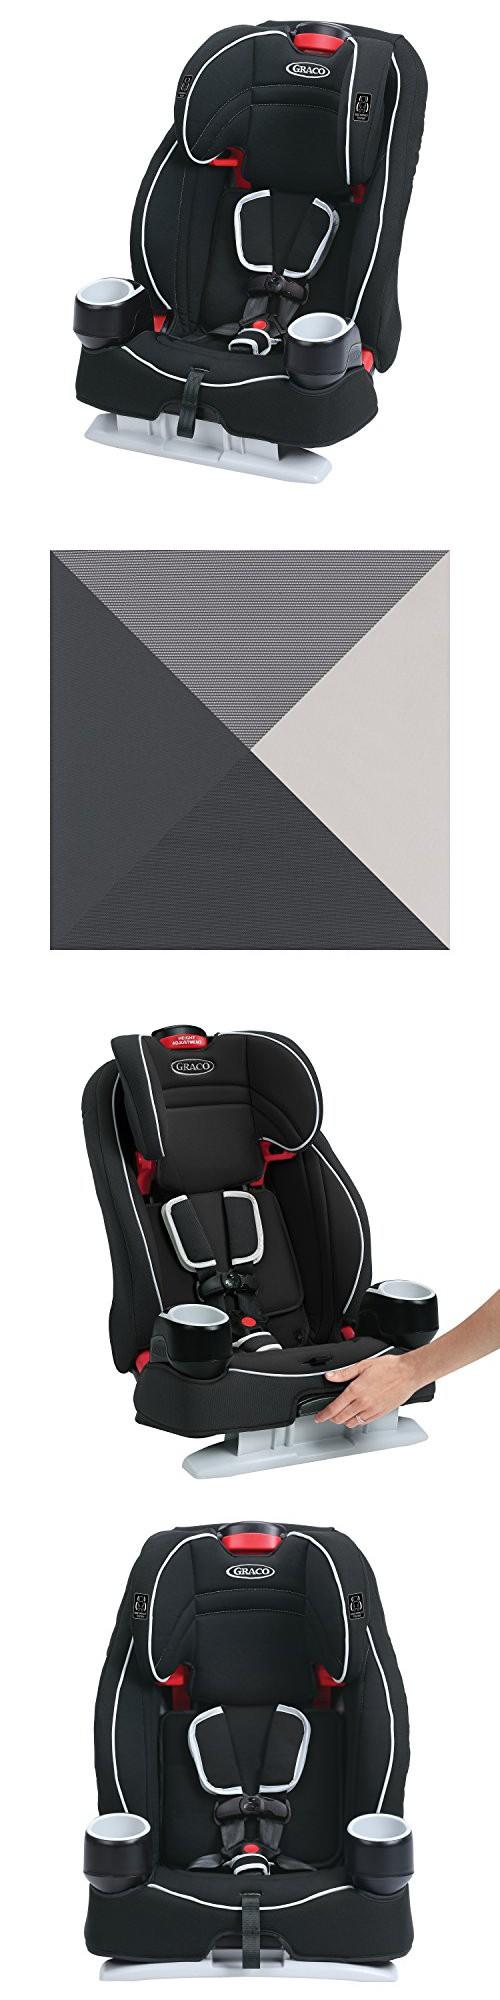 Graco Atlas 65 2in1 Harness Booster Car Seat, Glacier